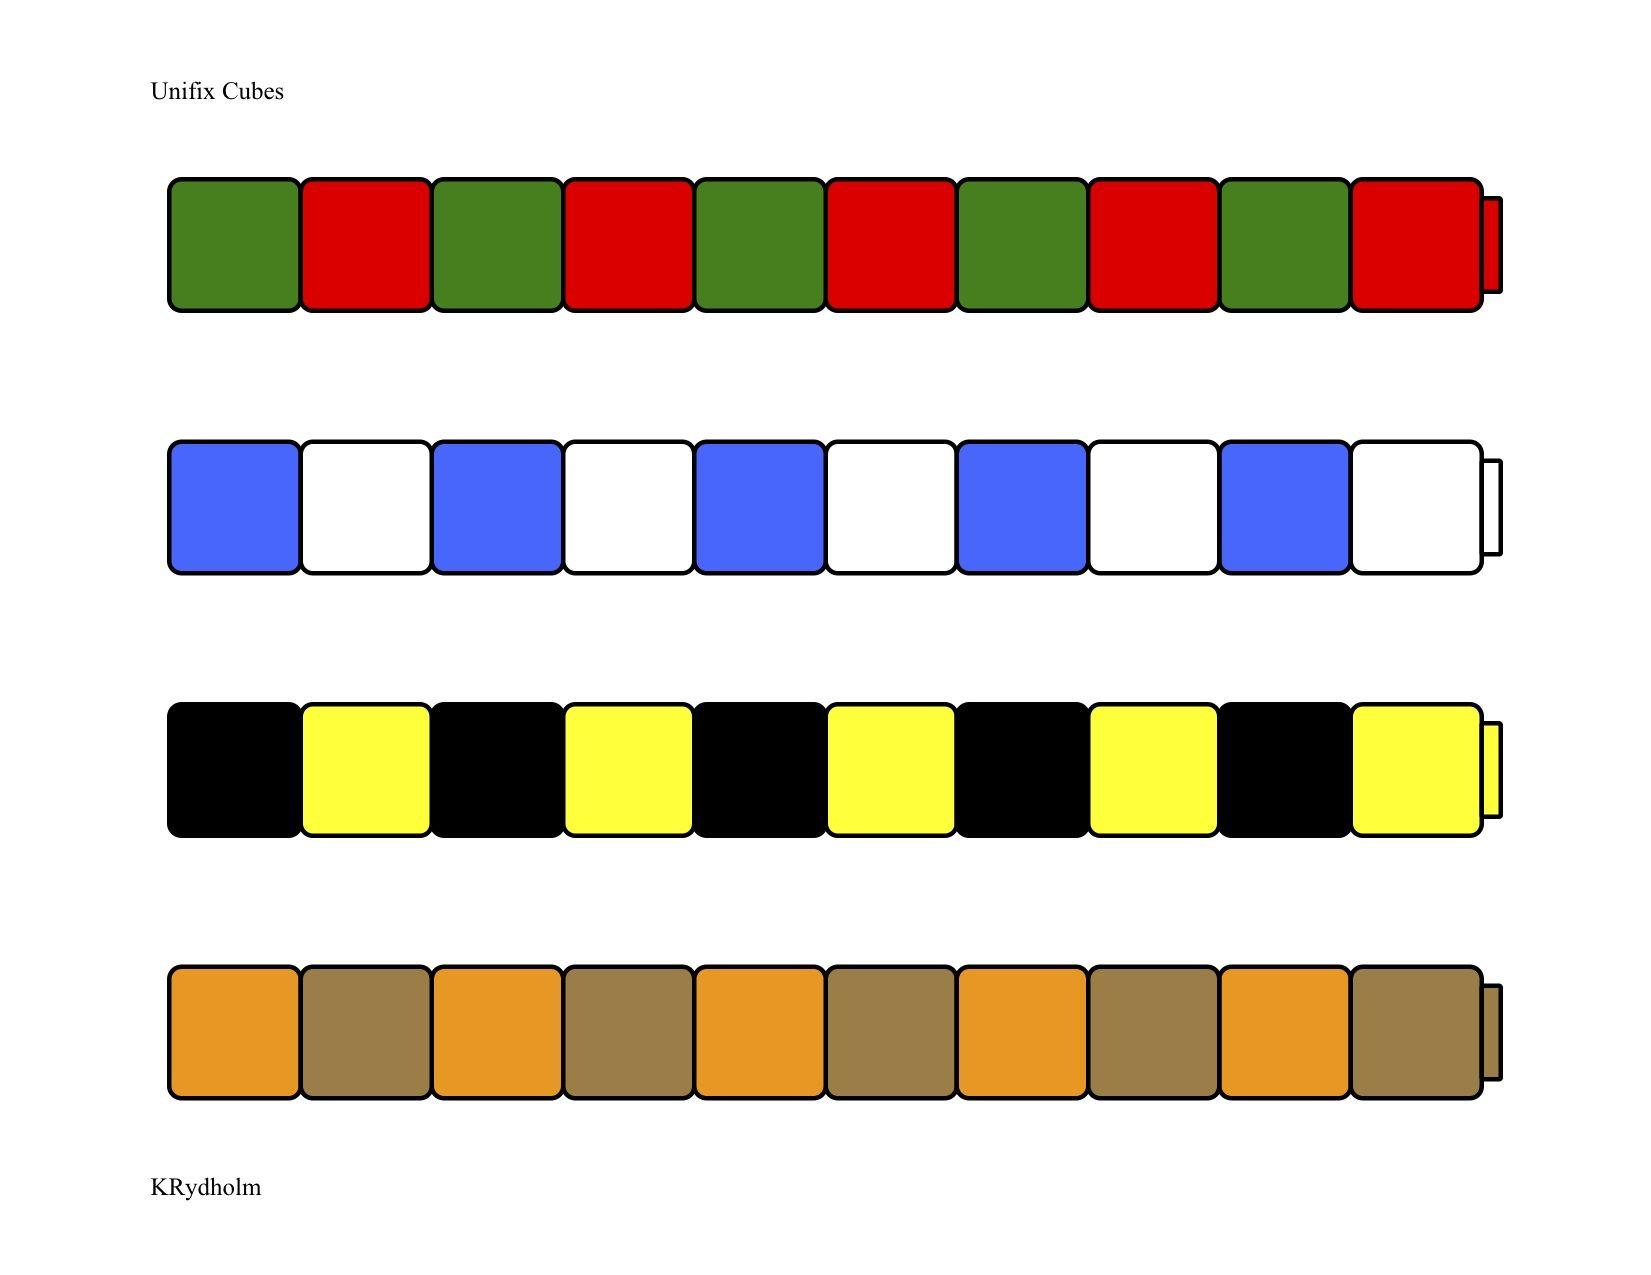 Unifix Patterns 1 Work